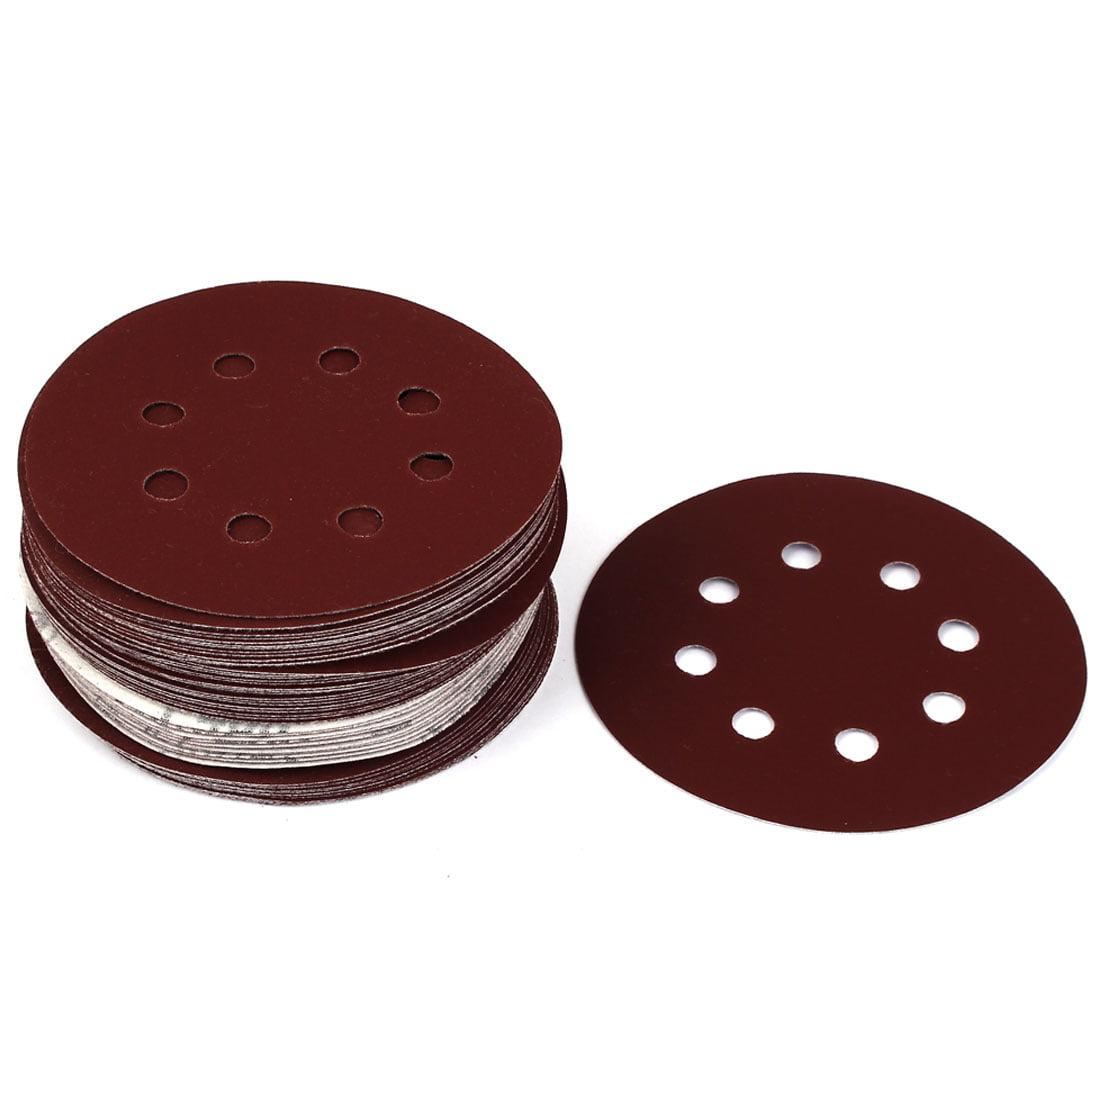 "5"" Dia 400 Grit 8 Holes Sanding Paper Disc Sandpaper 50pcs for Oscillating Tool - image 3 of 3"